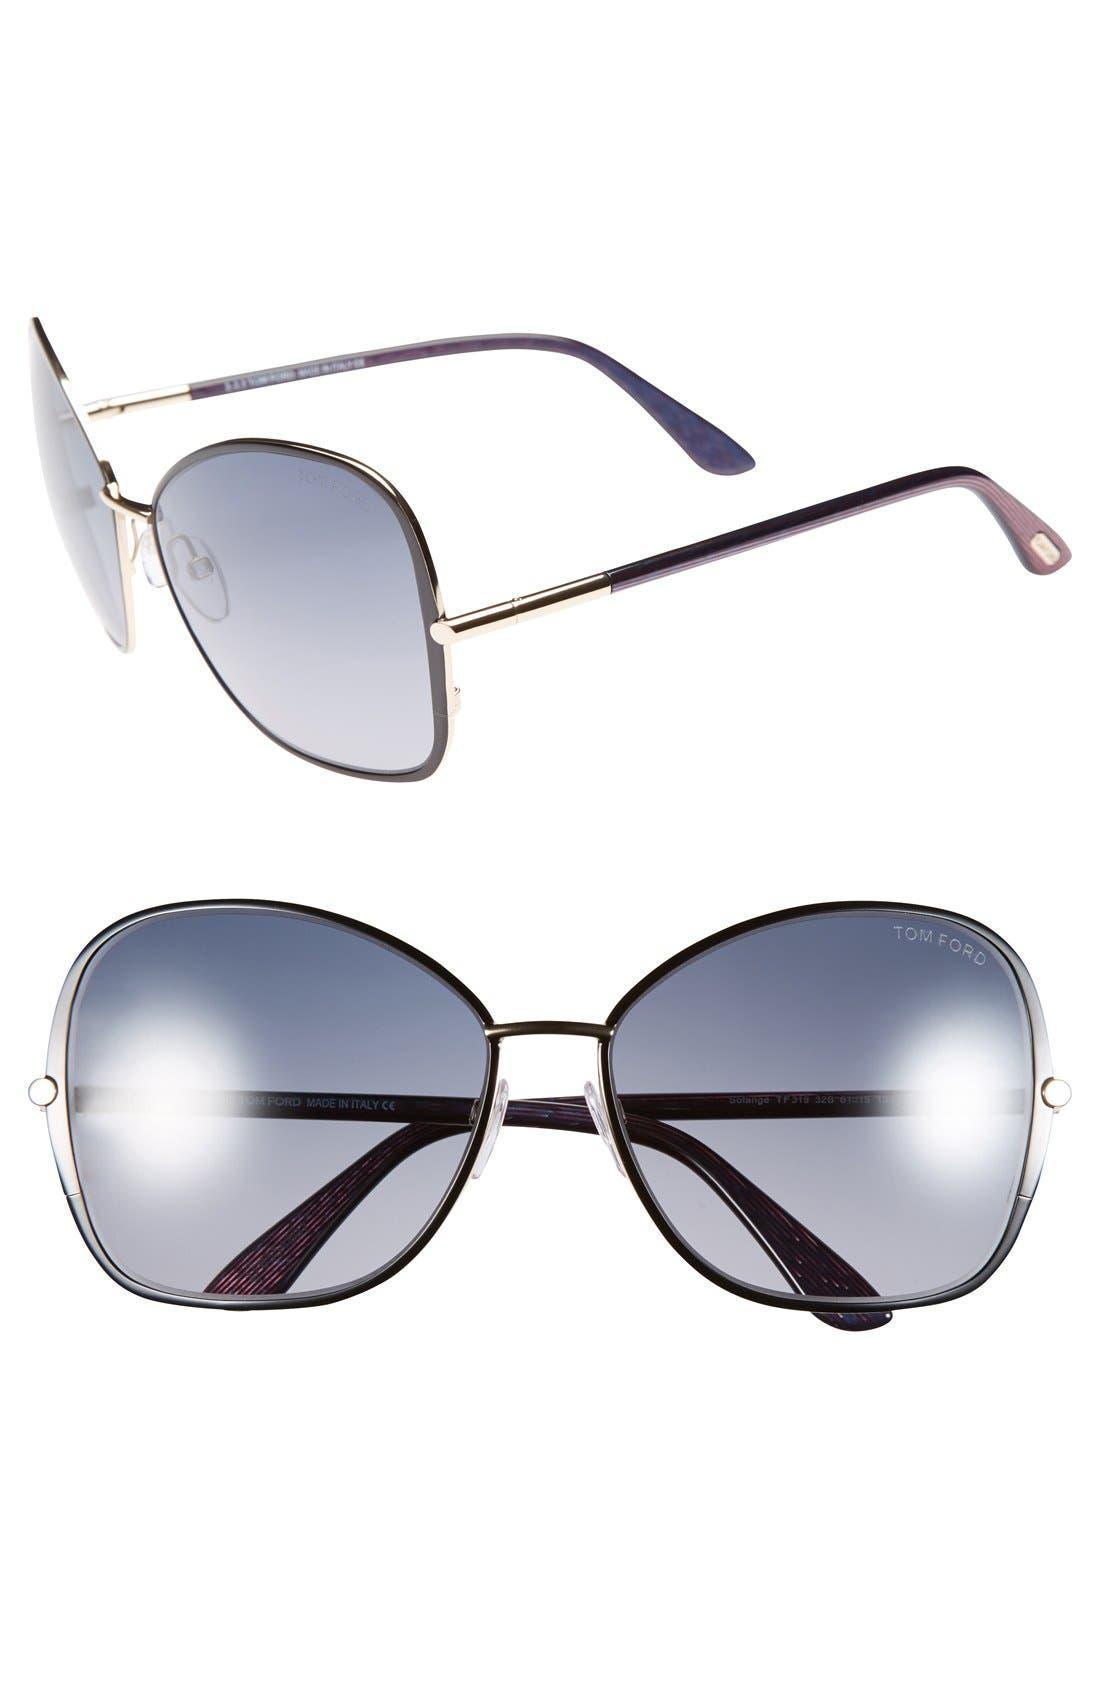 TOM FORD,                             'Solange' 61mm Sunglasses,                             Main thumbnail 1, color,                             001